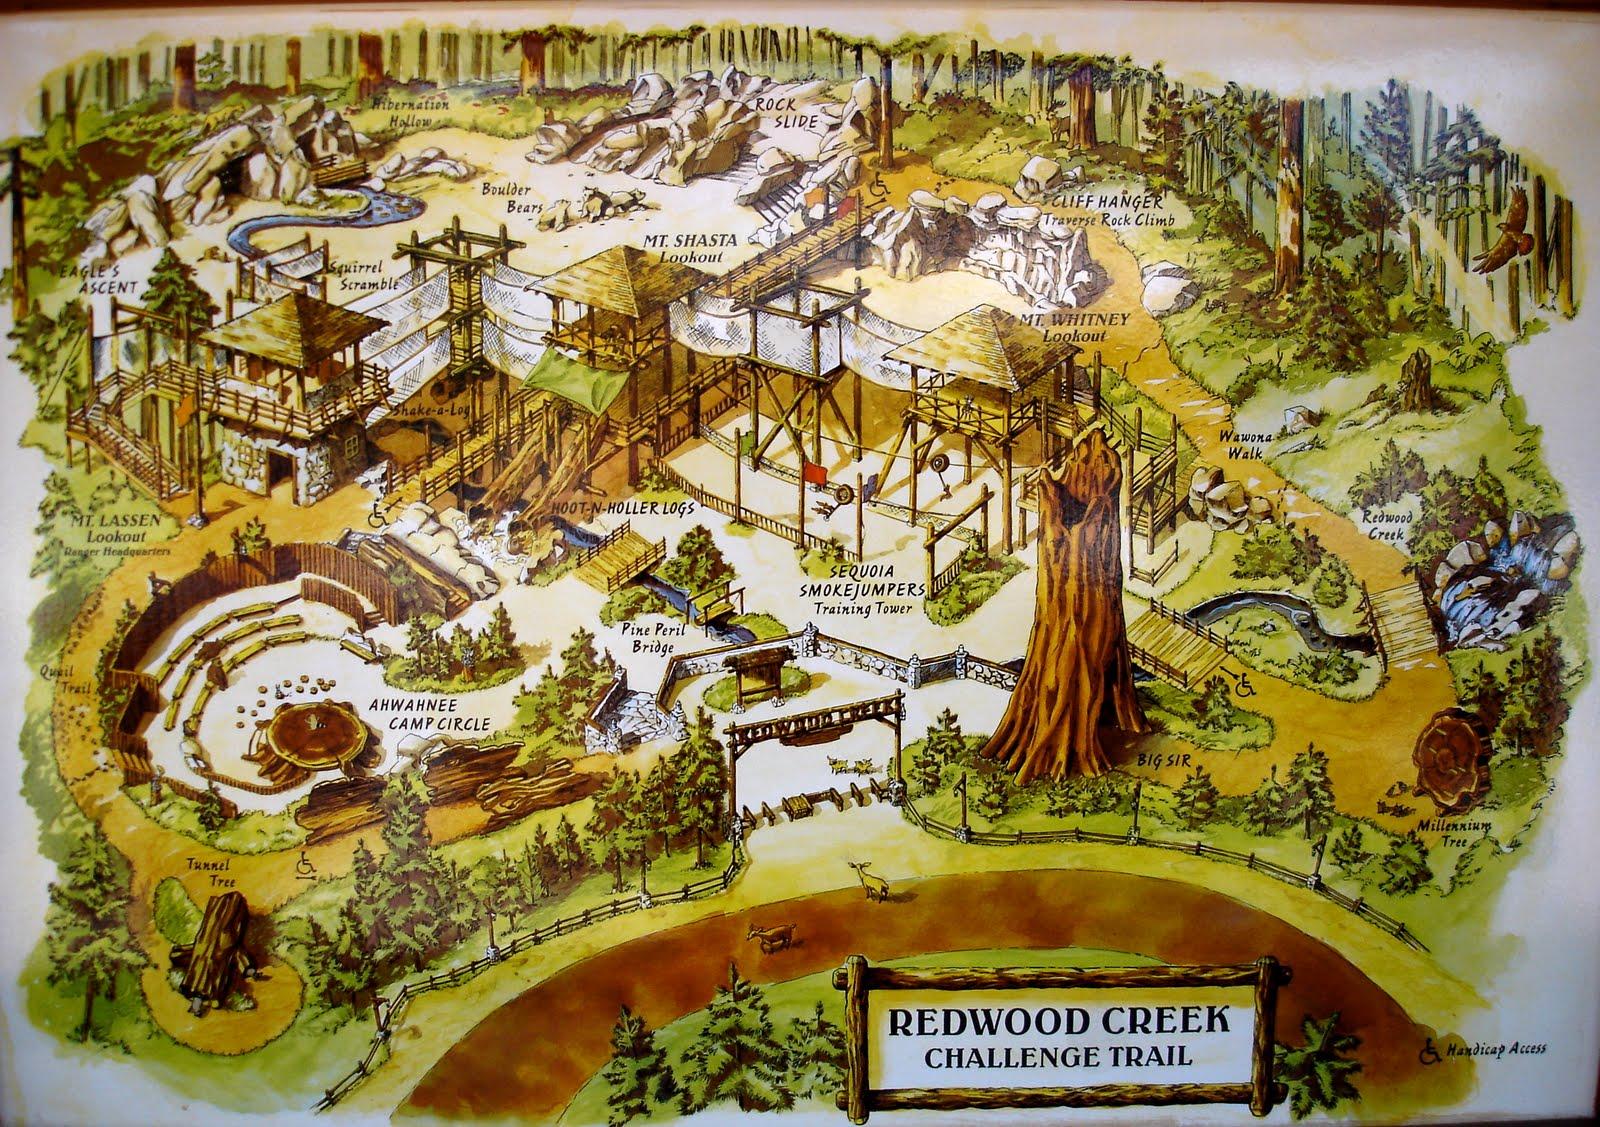 Redwood Creek Challenge Trail Disneywiki